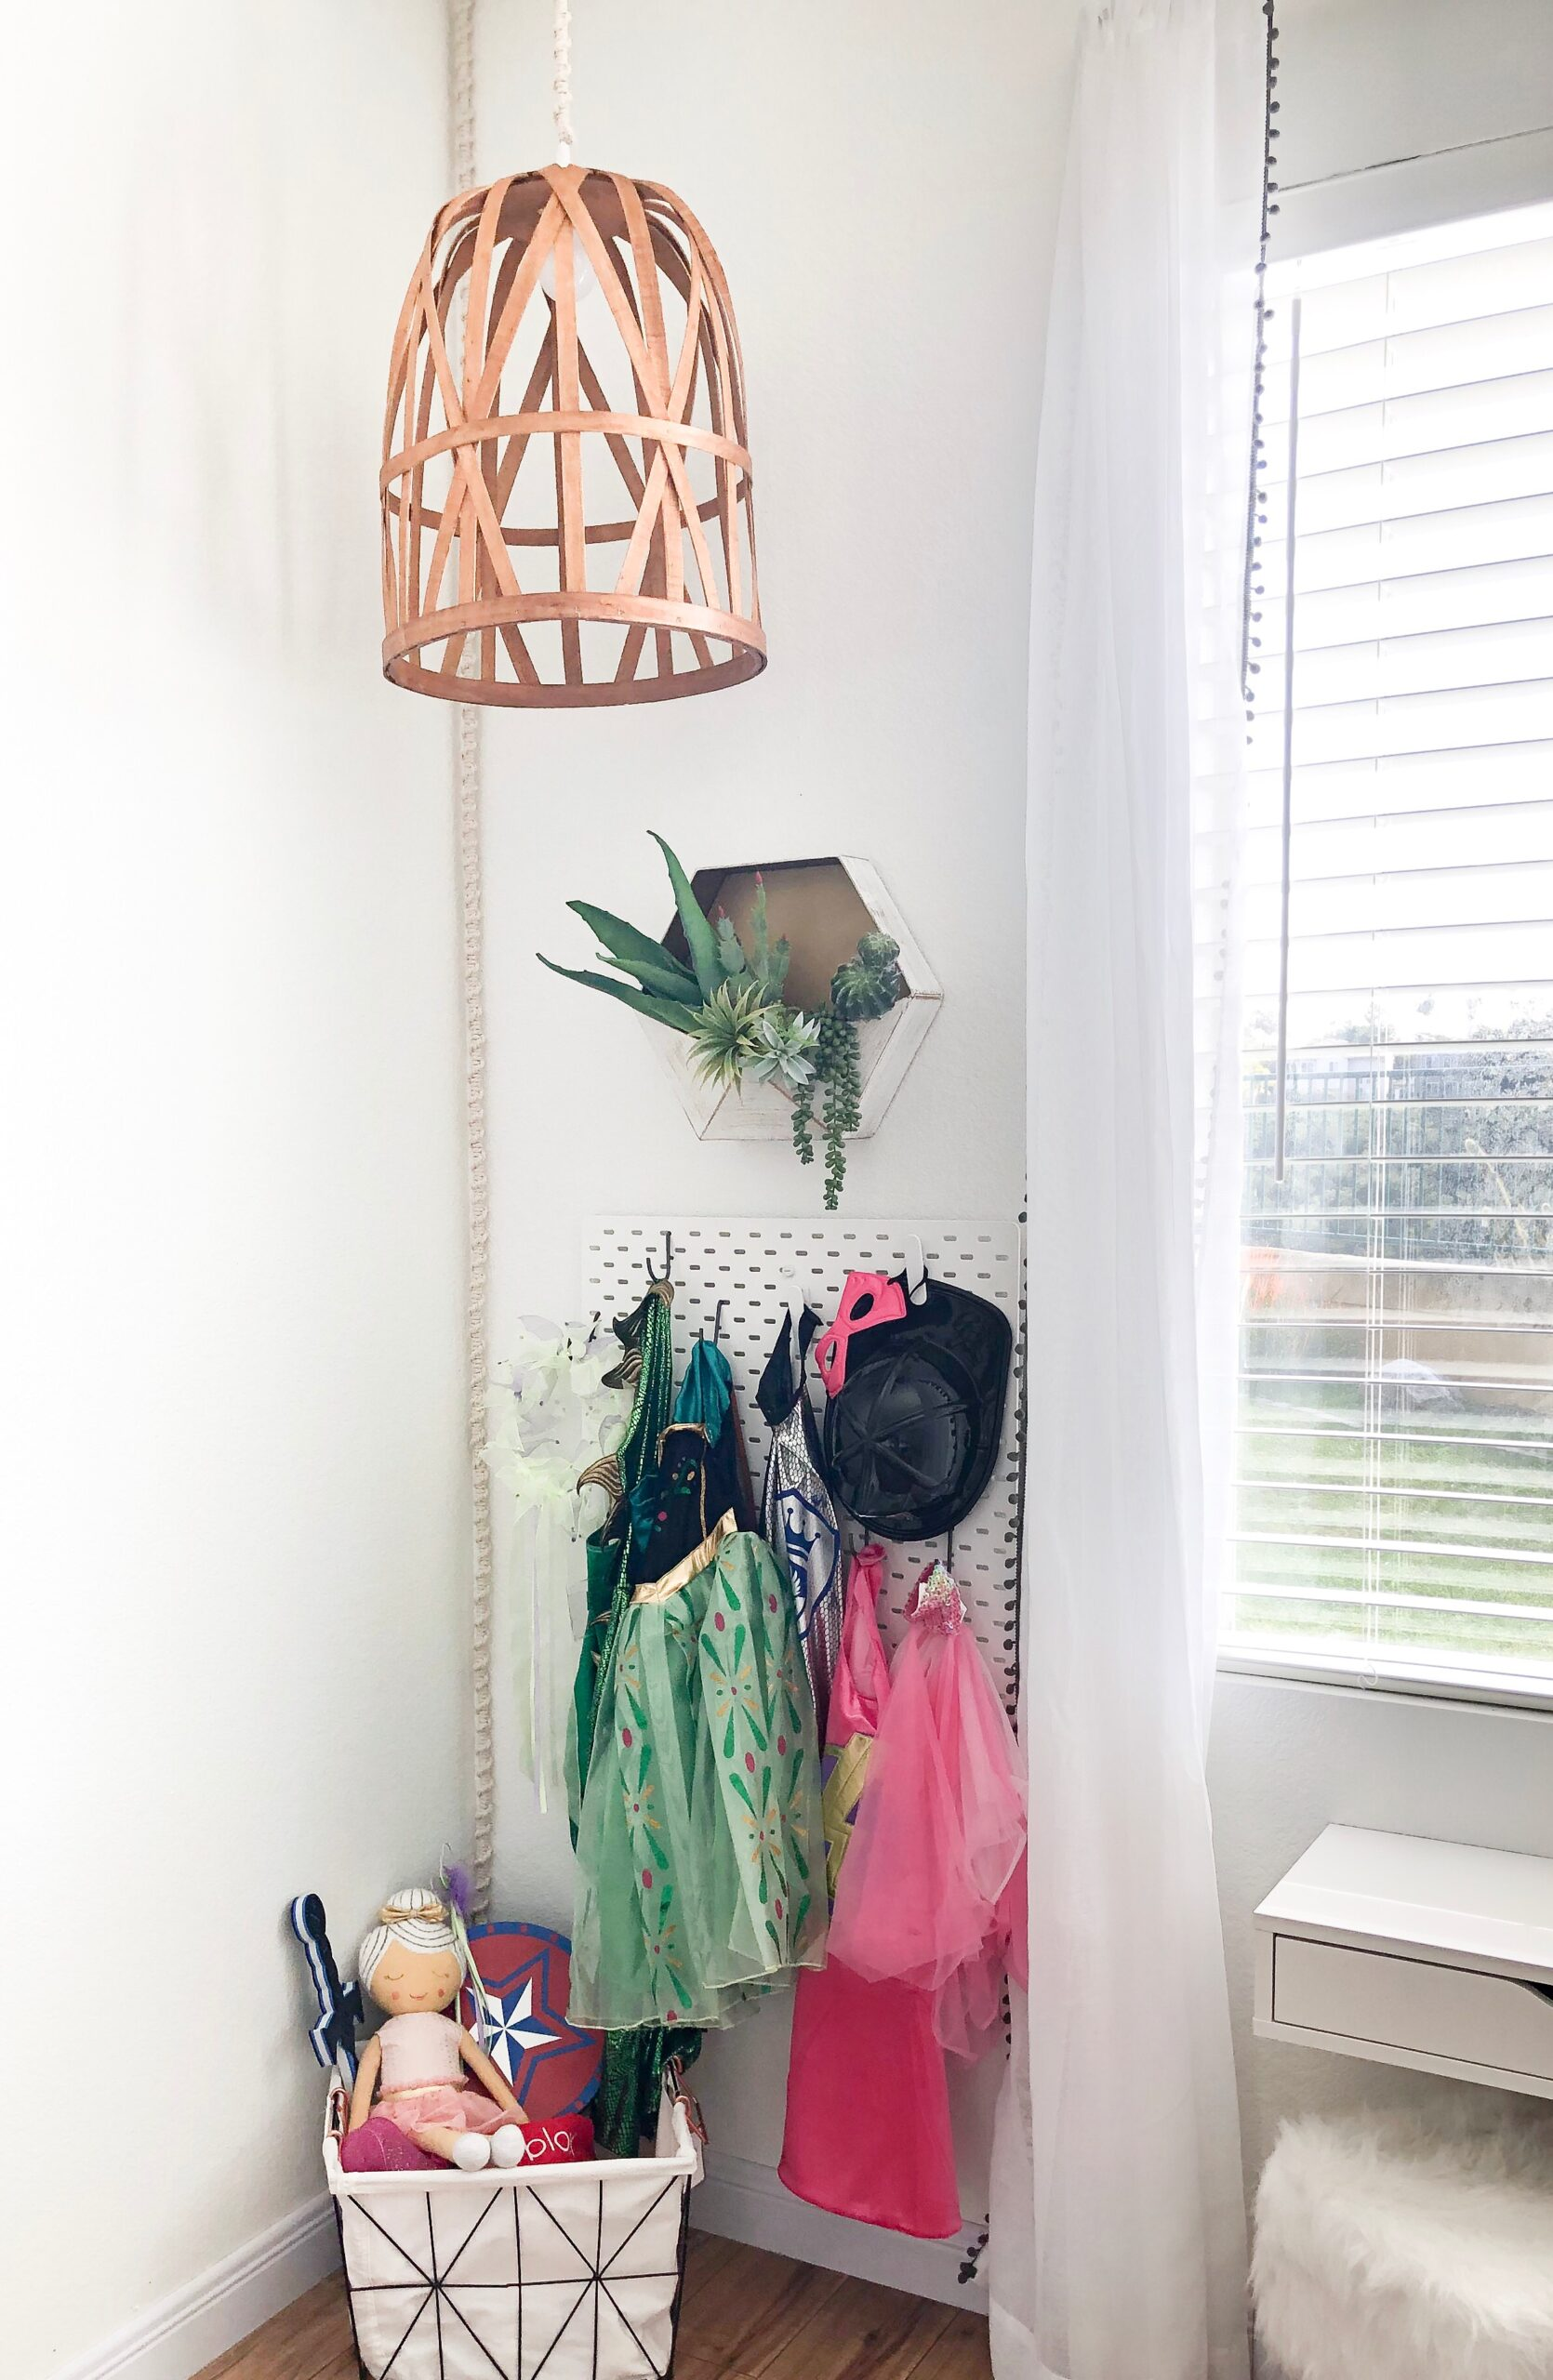 DIY Basket Light & Macrame Cord